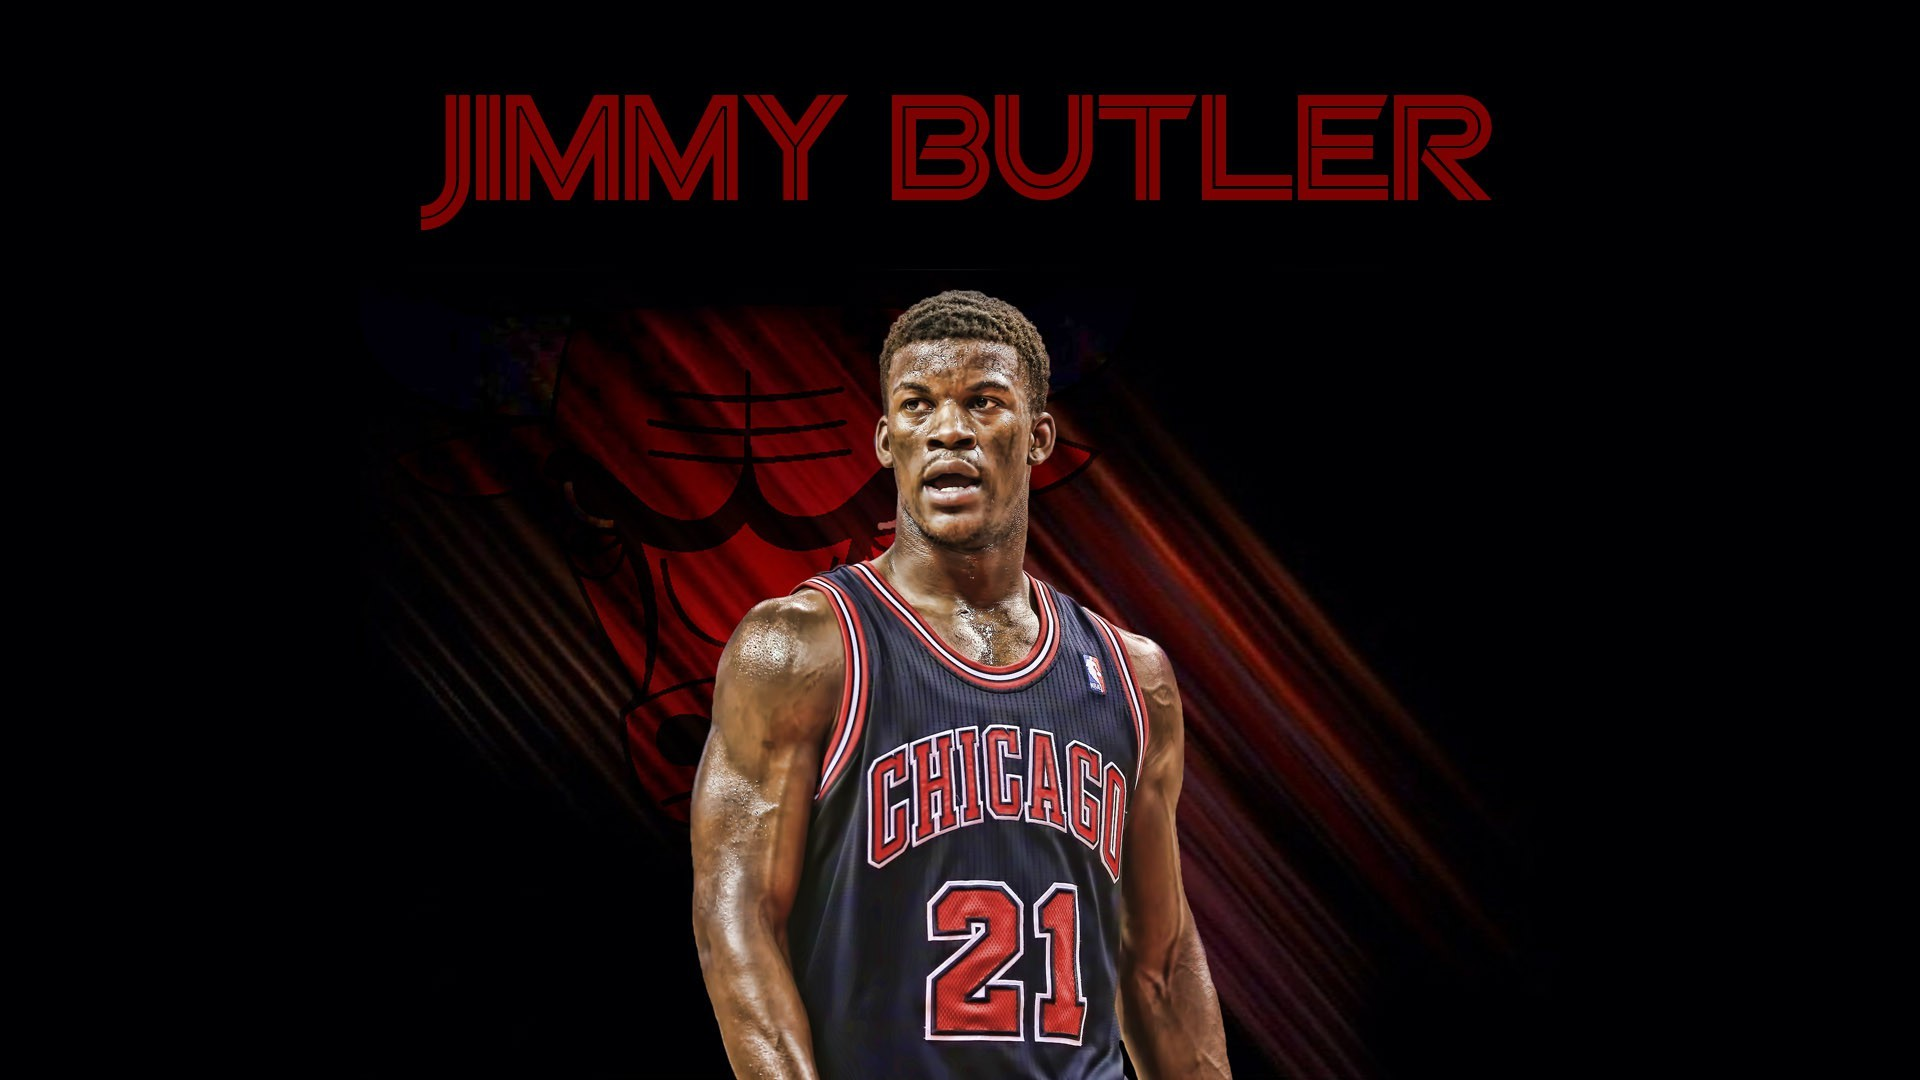 jimmy-butler-chicago-bulls-wallpaper